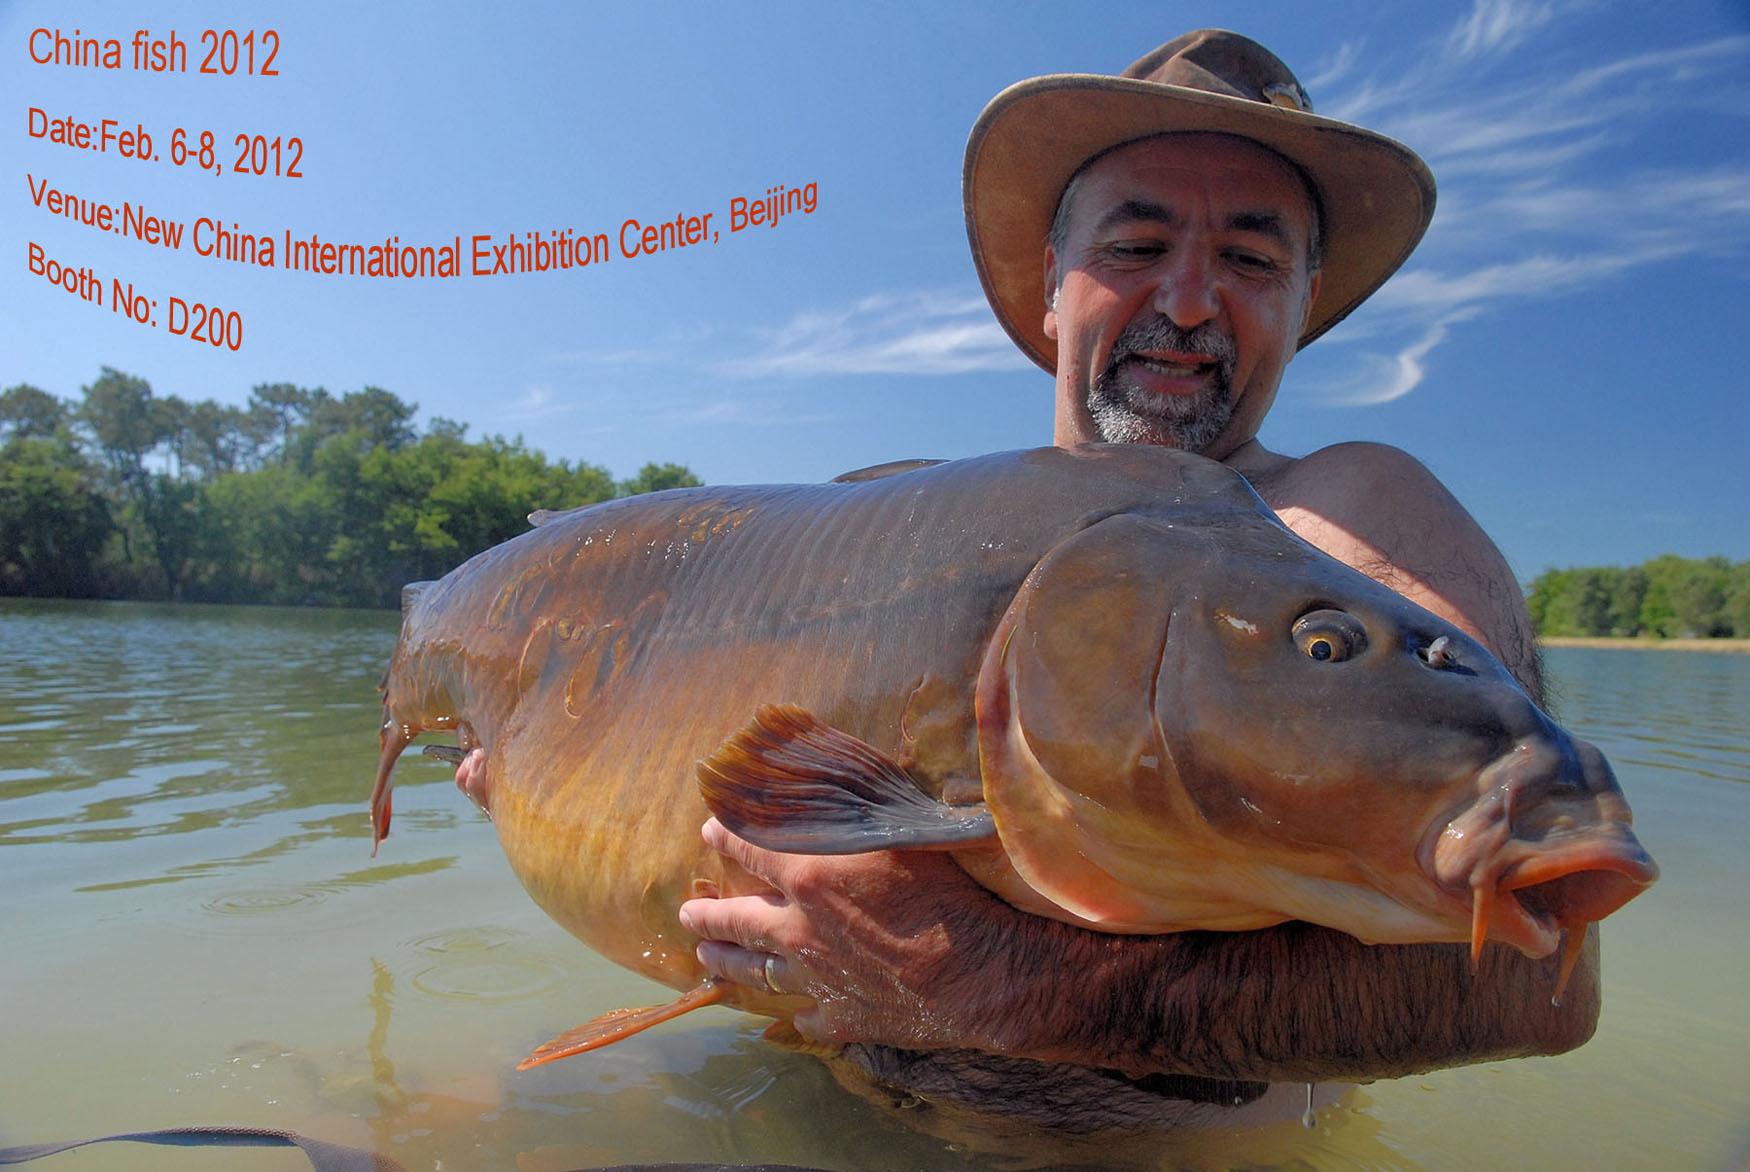 China fish 2012